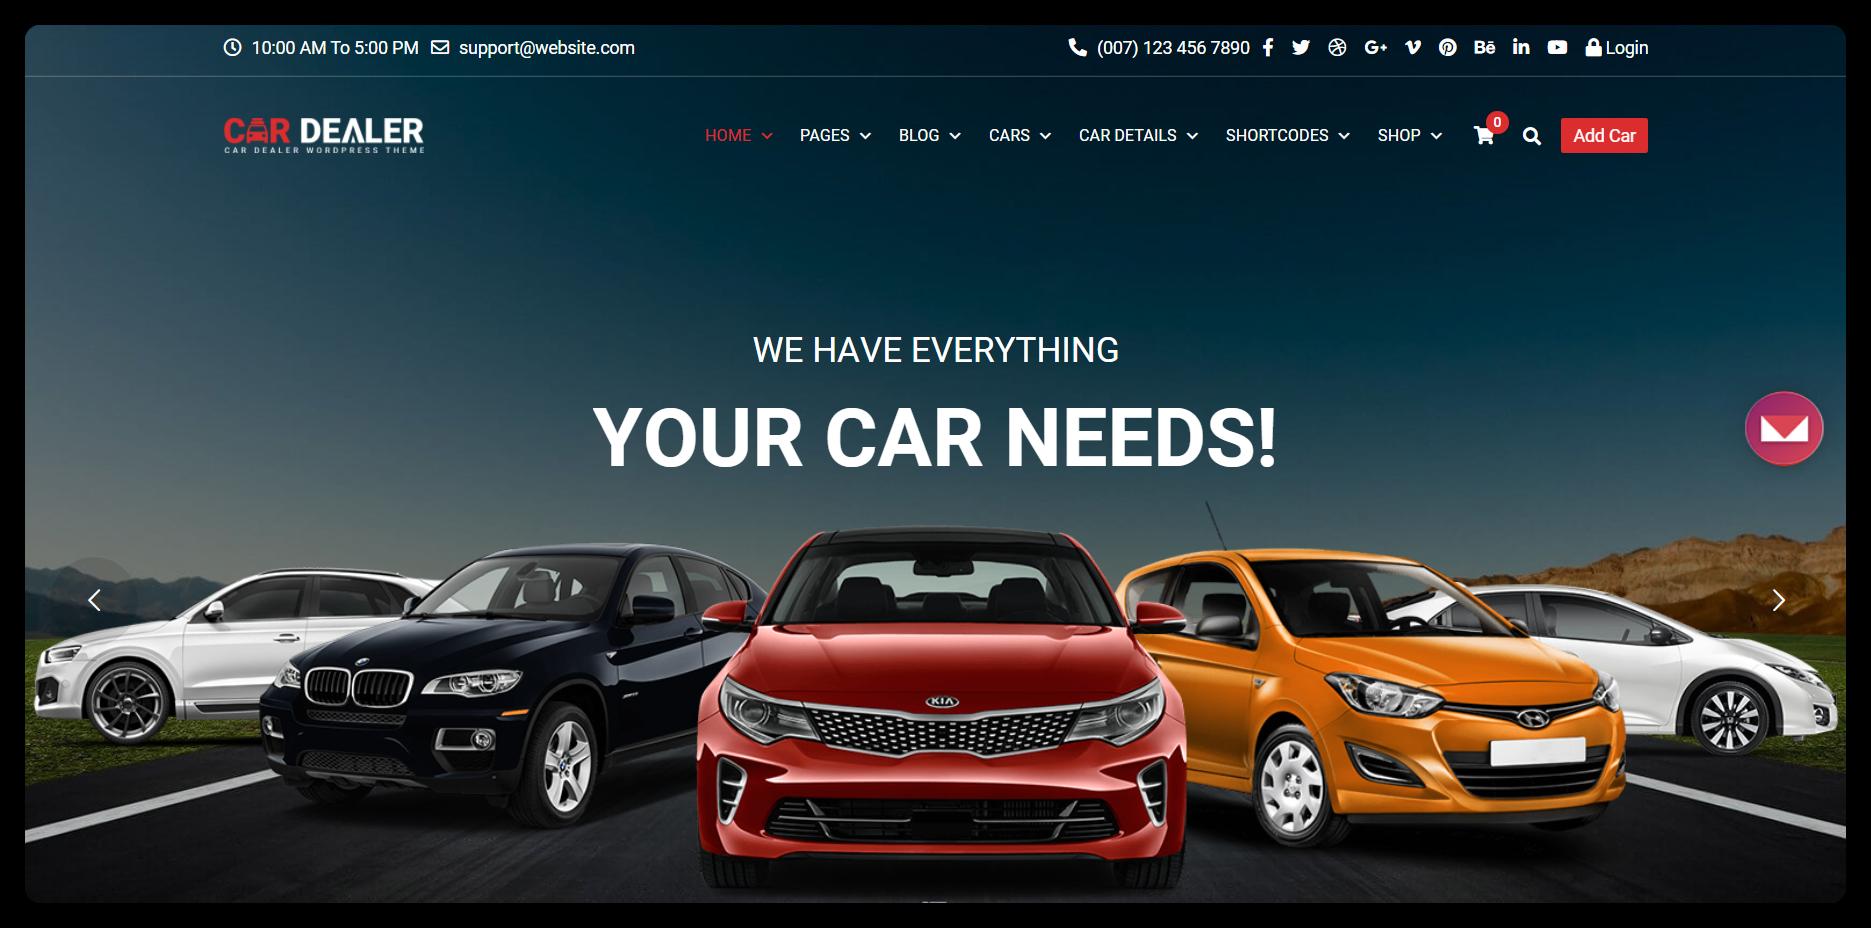 Онлайн чат для автоиндустрии